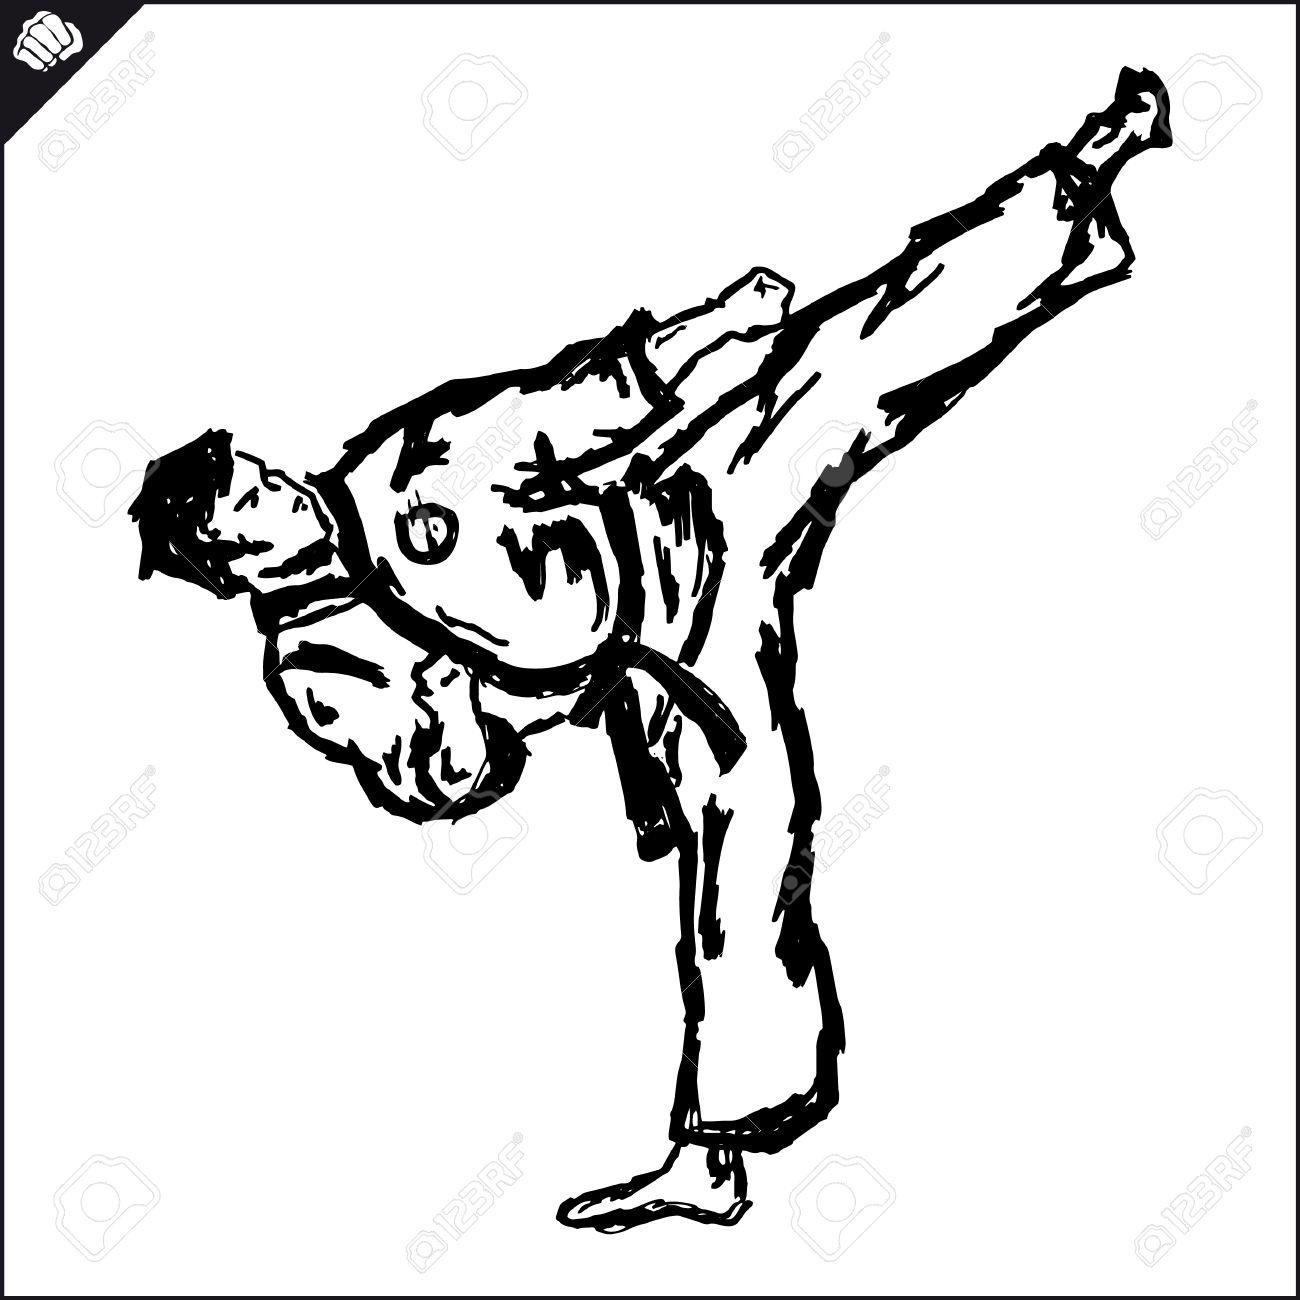 fighting arts karate taekwondo hapkido jiu jitsu royalty free rh 123rf com free jiu jitsu clipart brazilian jiu jitsu clipart